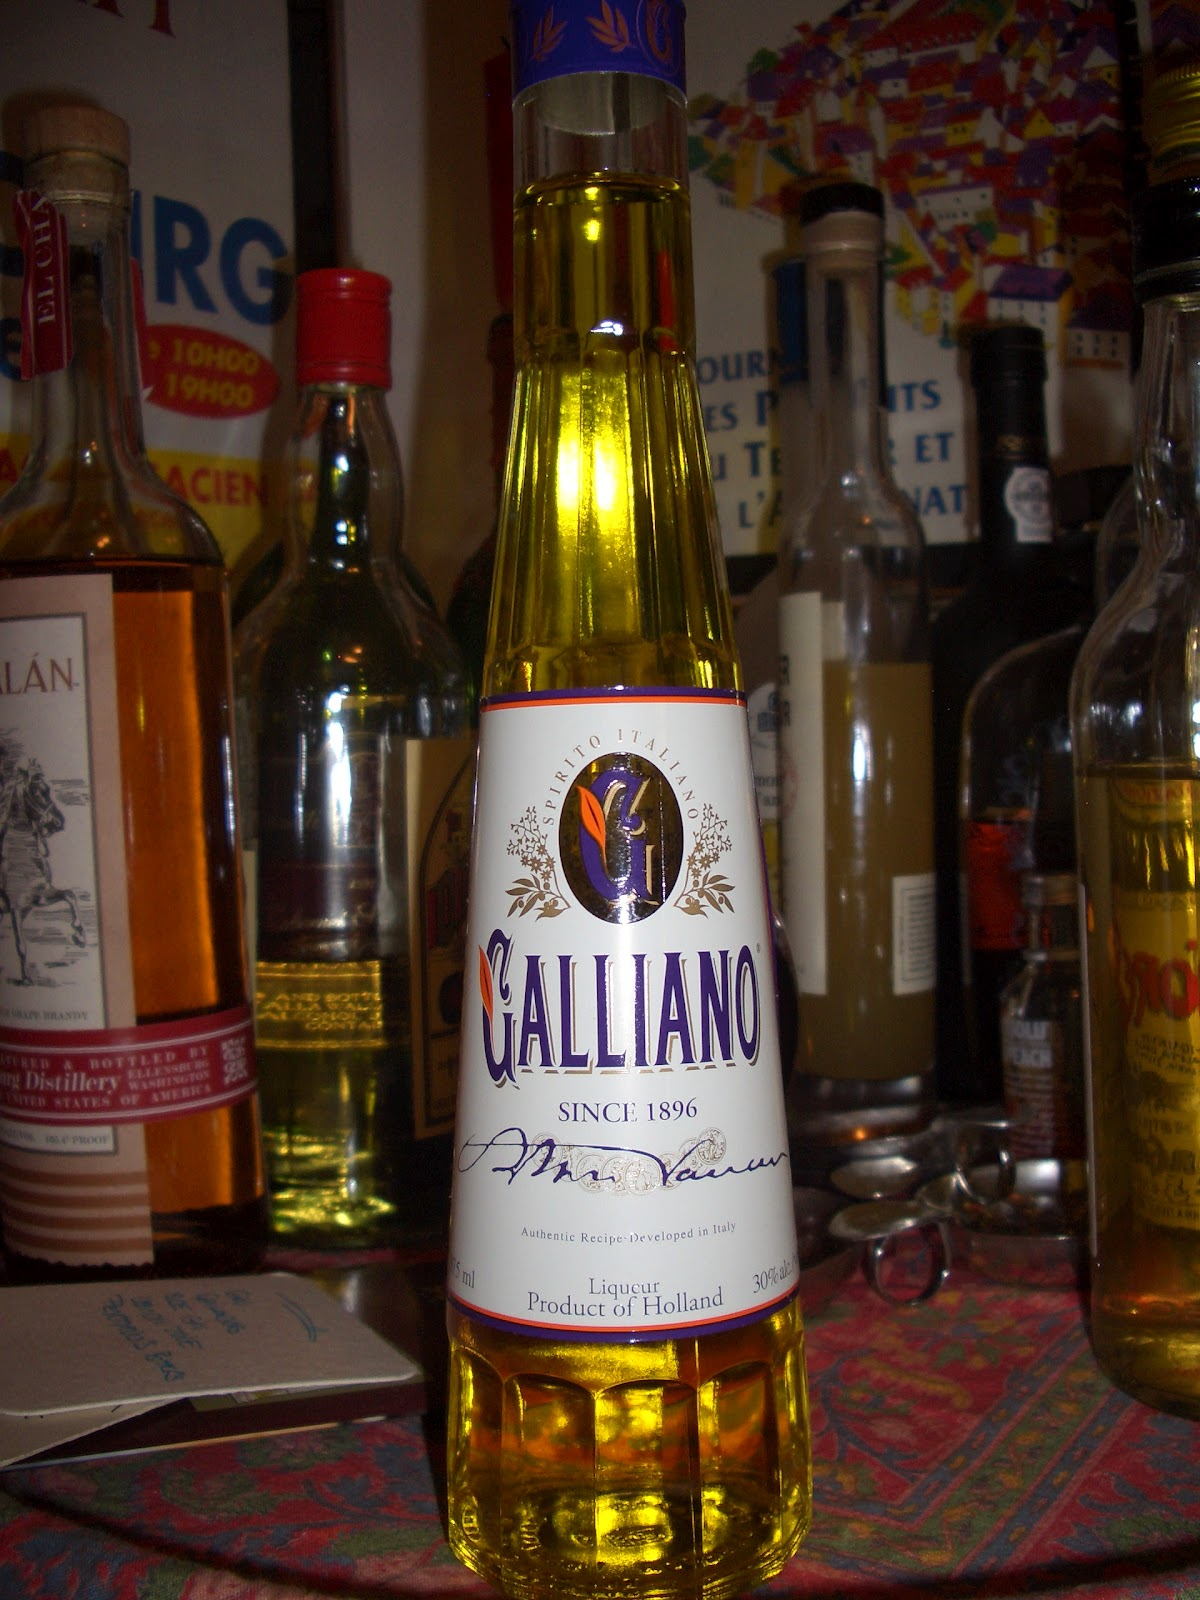 Galliano Drink